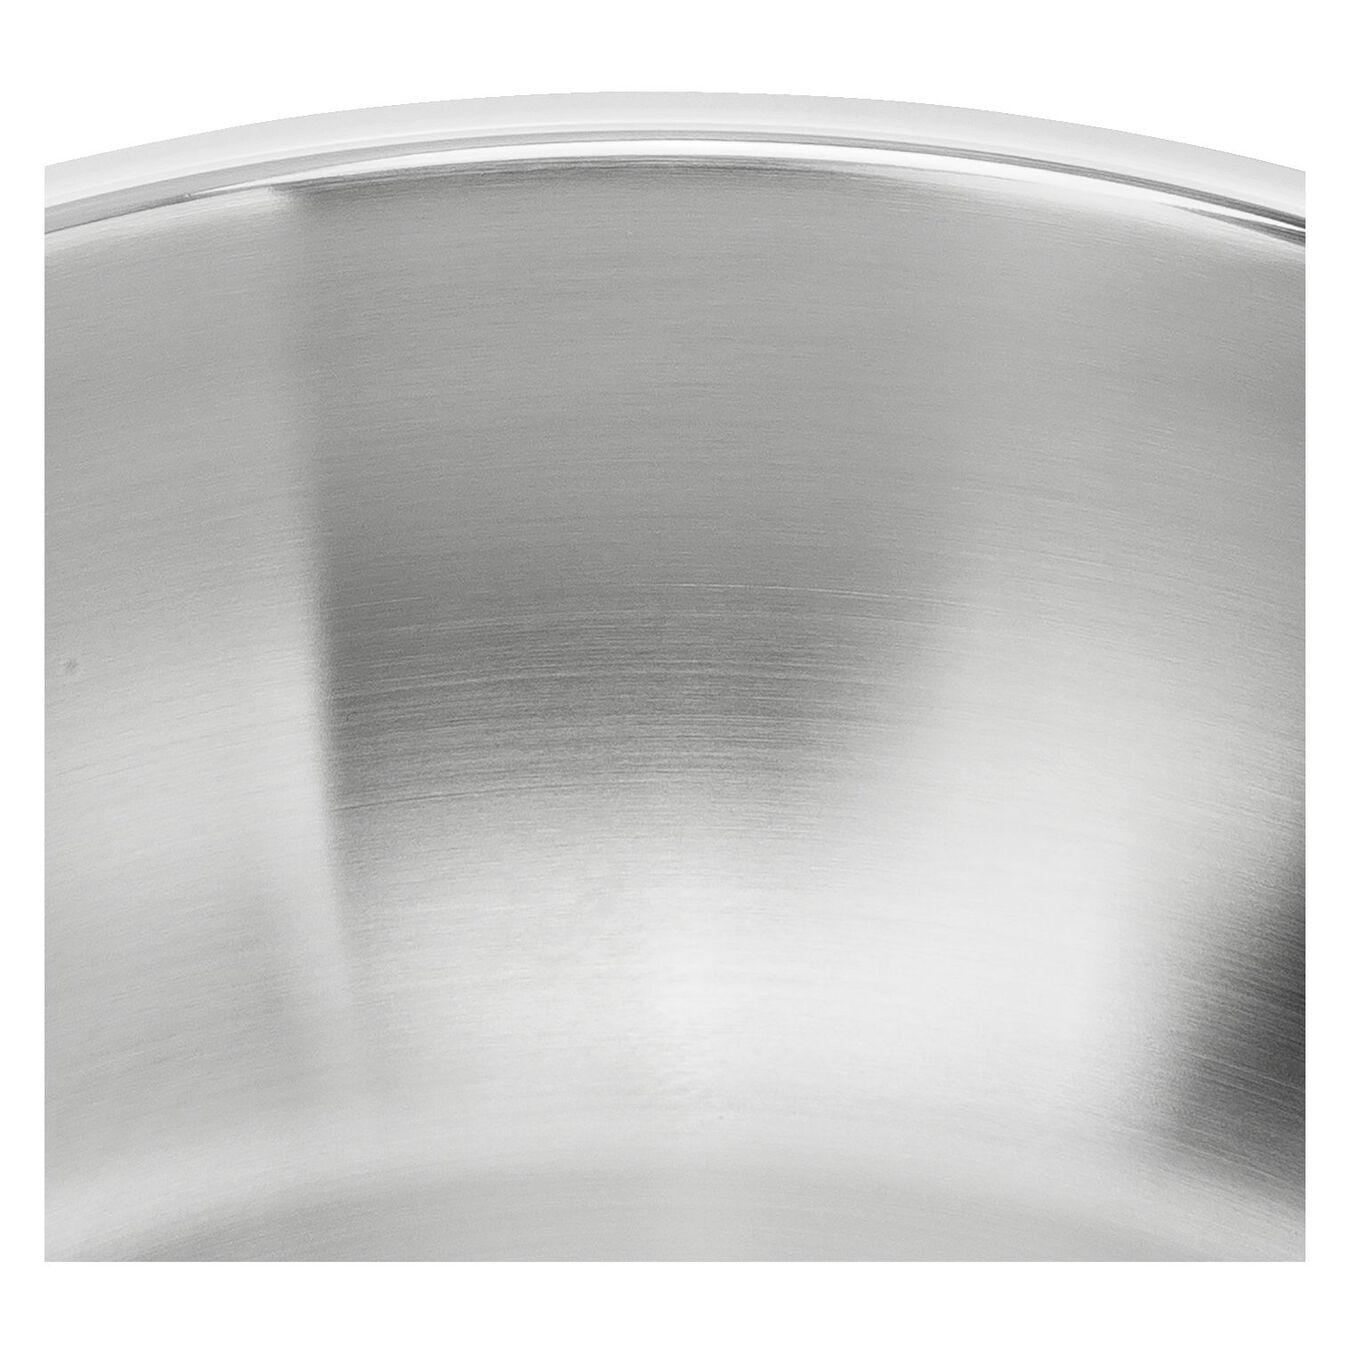 Wok 30 cm, 18/10 Edelstahl,,large 4